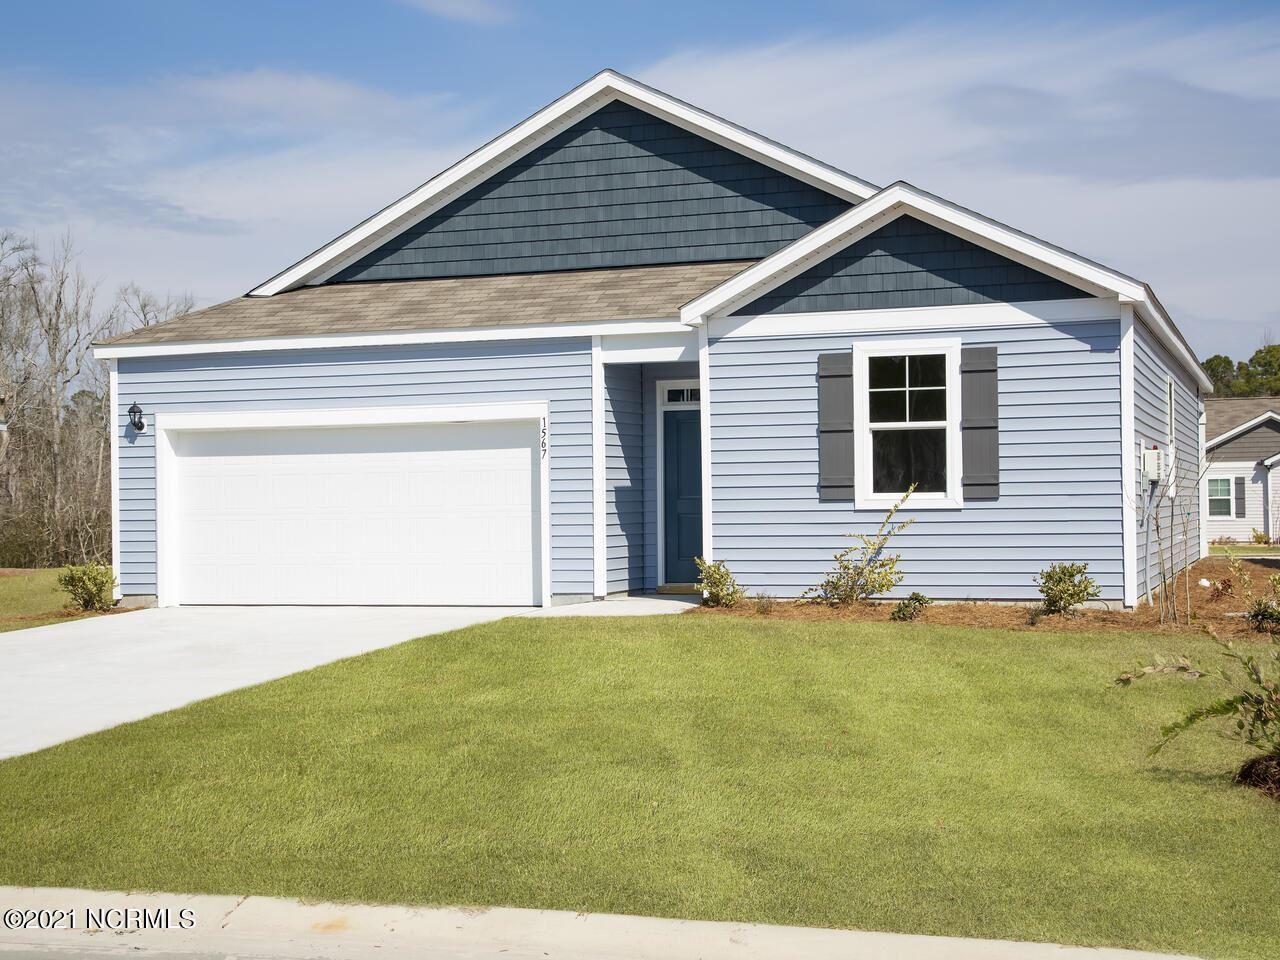 Photo of 2529 Sandy Banks Lane #138, Wilmington, NC 28401 (MLS # 100294642)